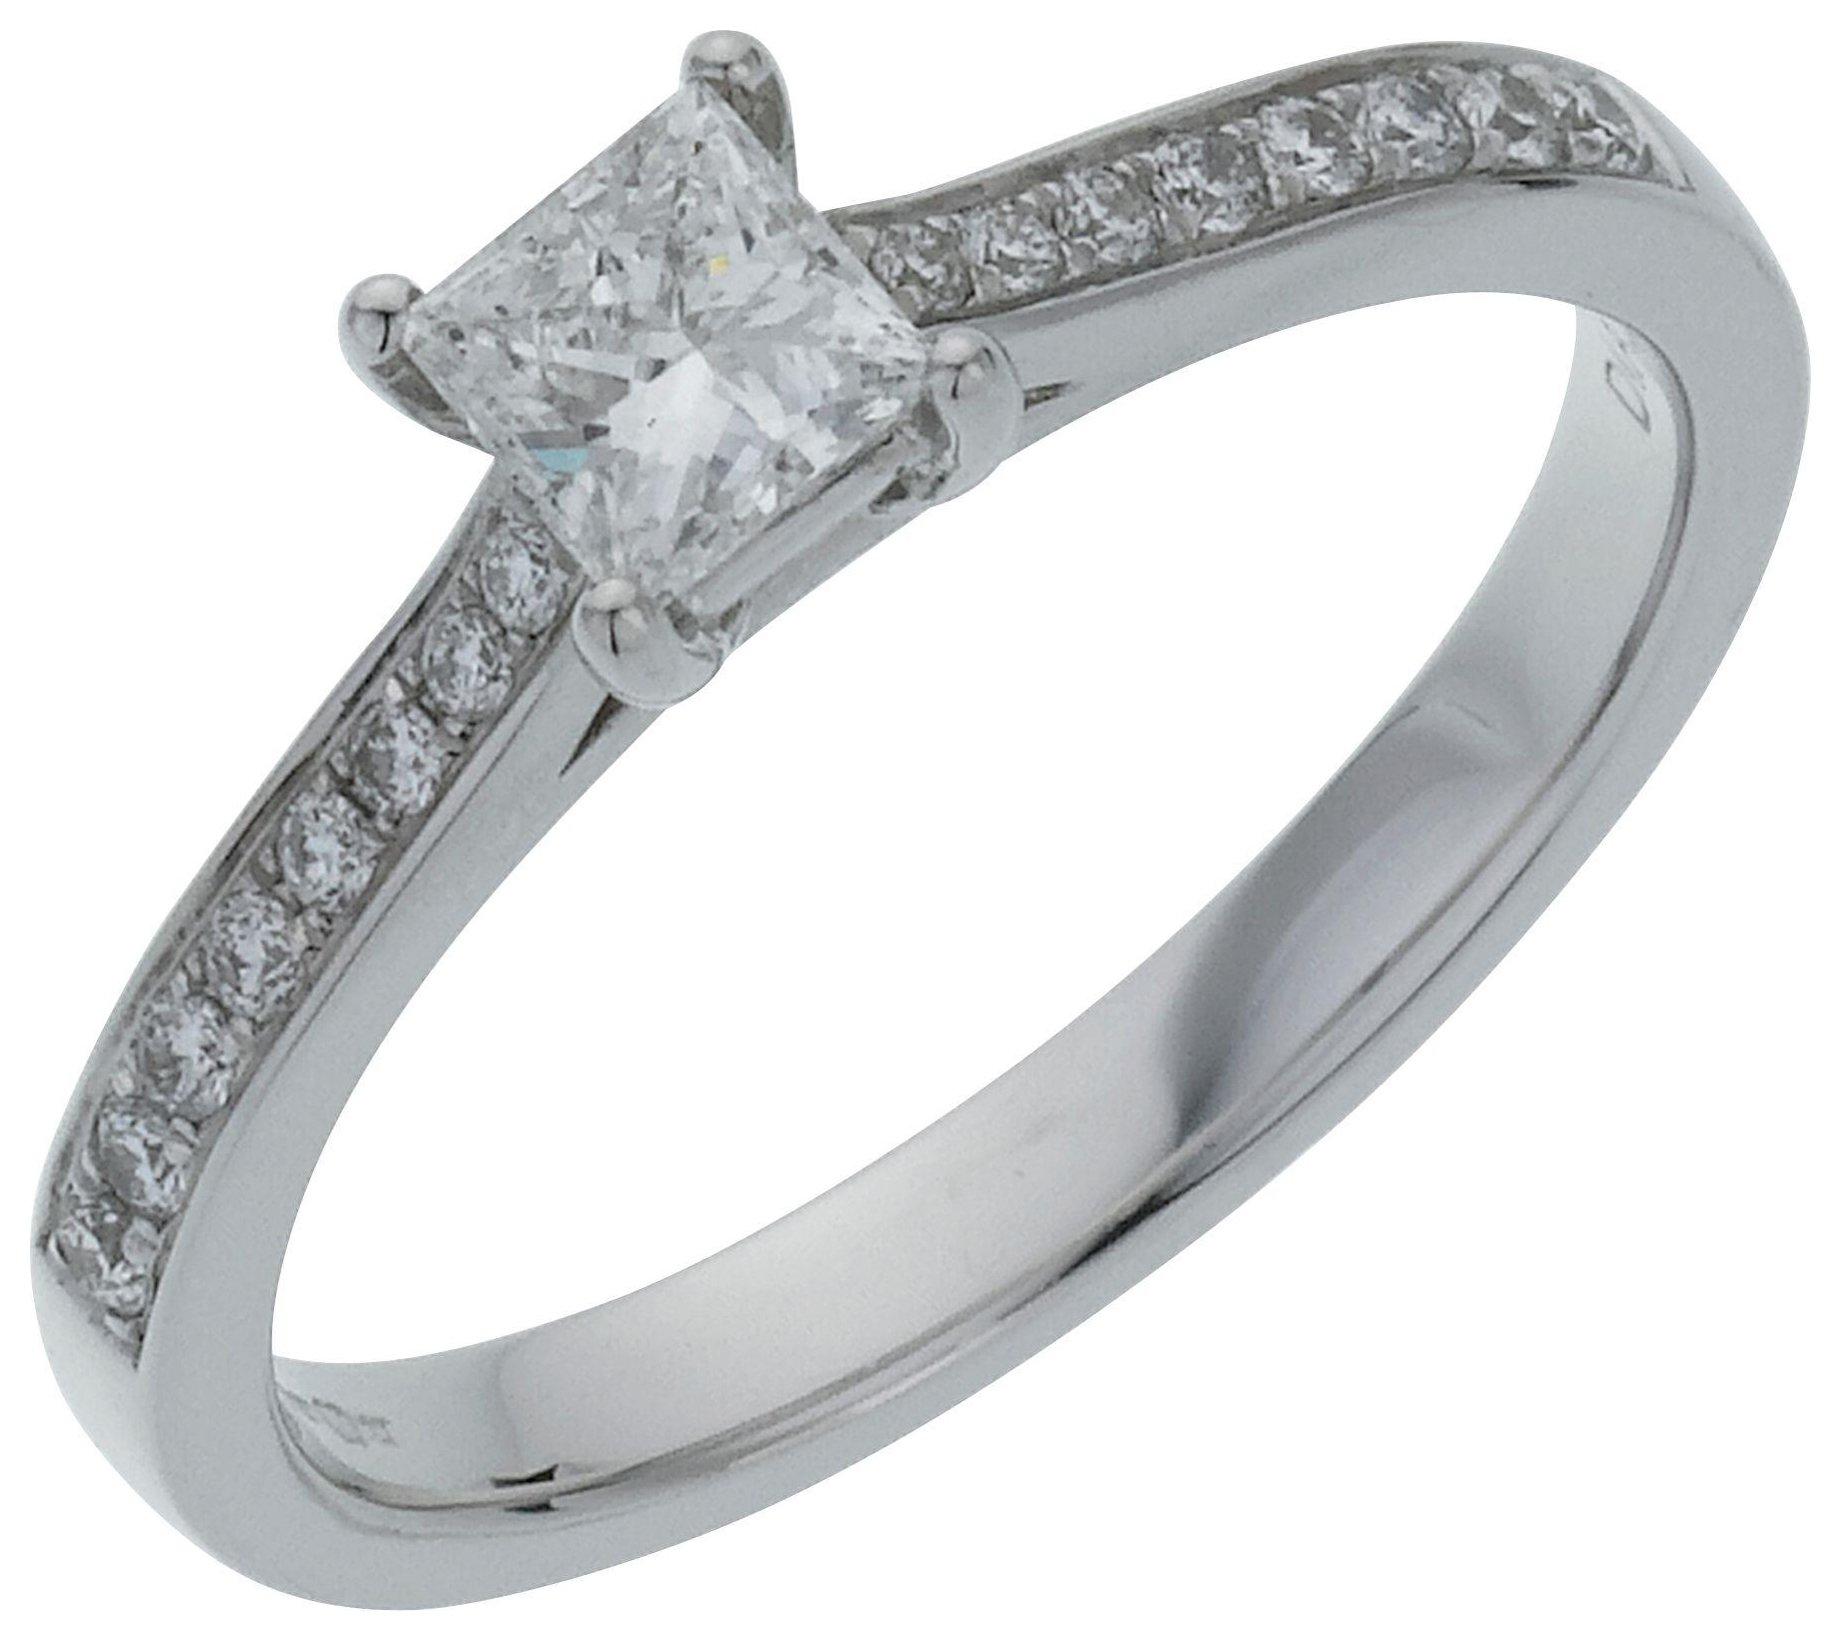 18 Carat White Gold 05 Carat Diamond - Princess Cut Shoulder Ring- V